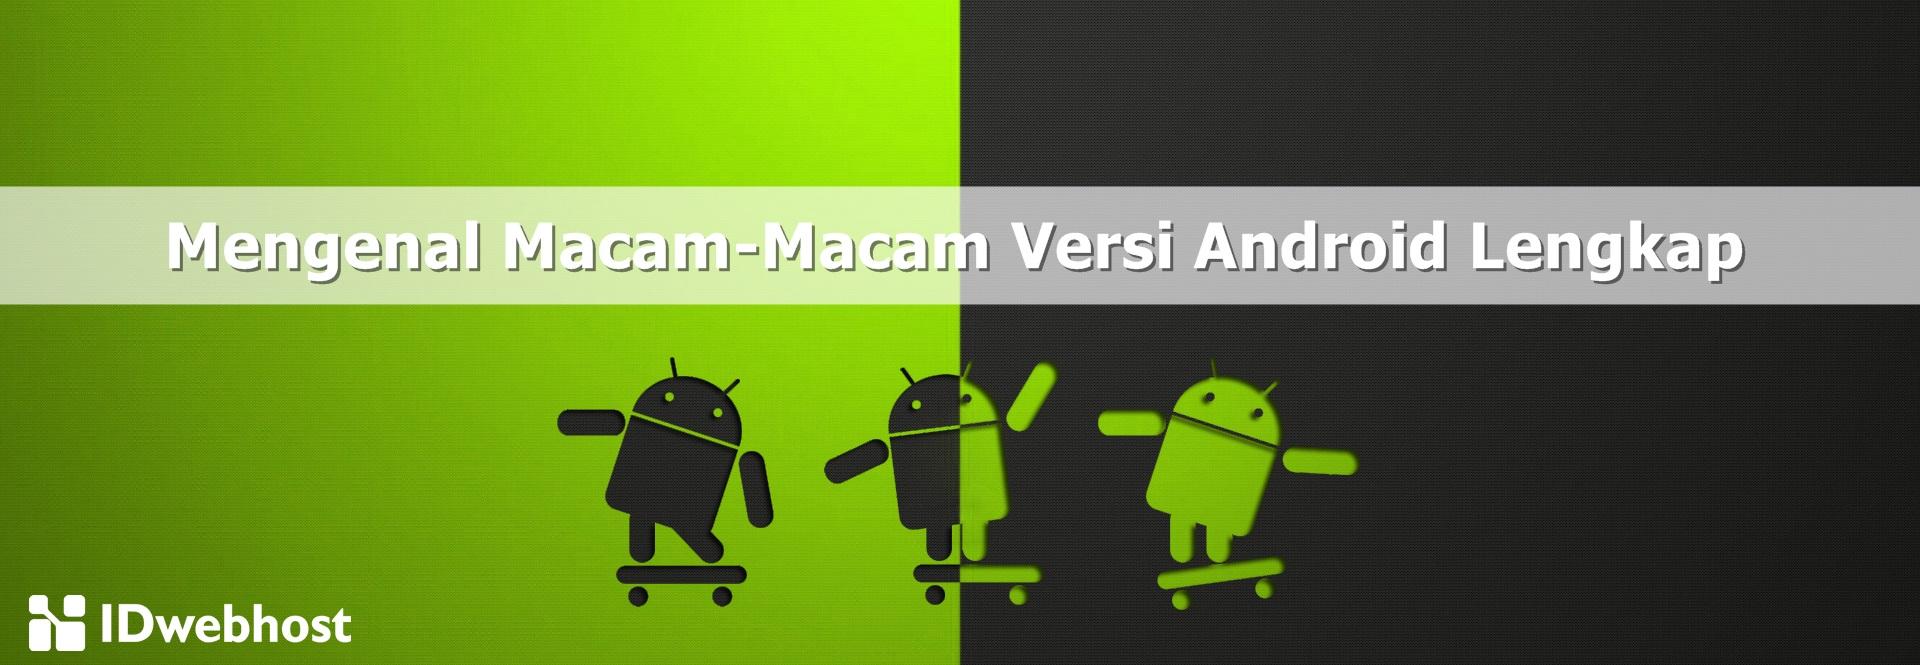 Mengenal Macam Macam Versi Android Lengkap Hingga Sekarang